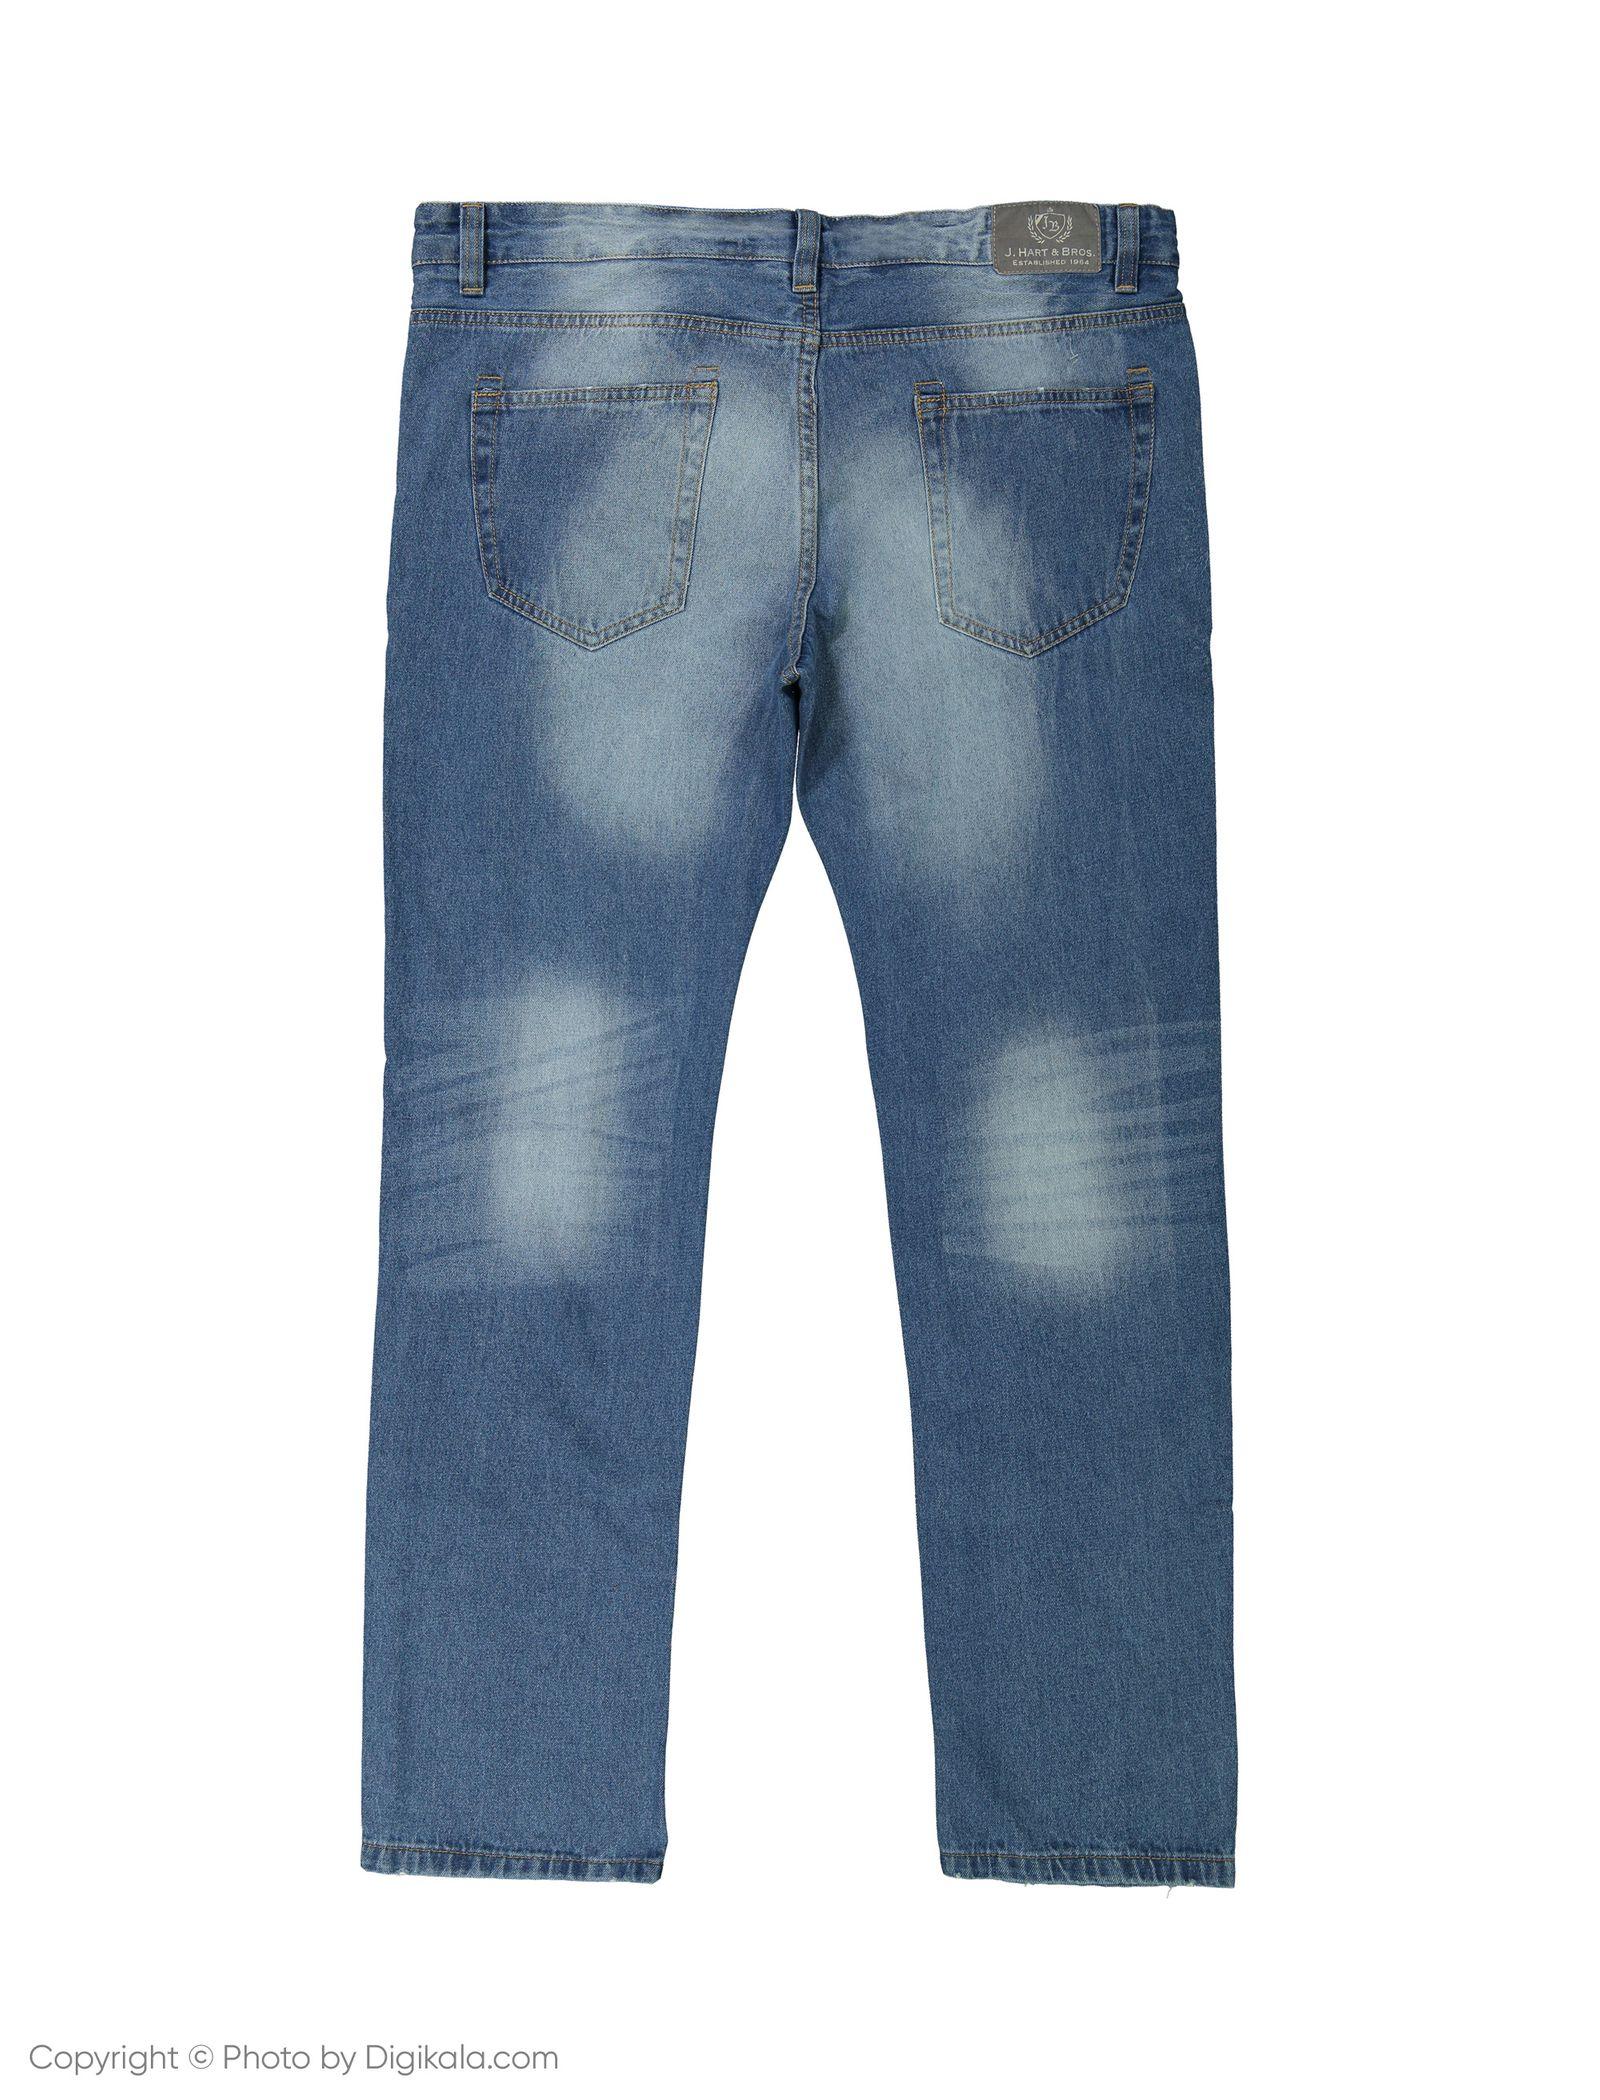 شلوار جین مردانه مردانه مدل 9984240 - یوپیم -  - 2